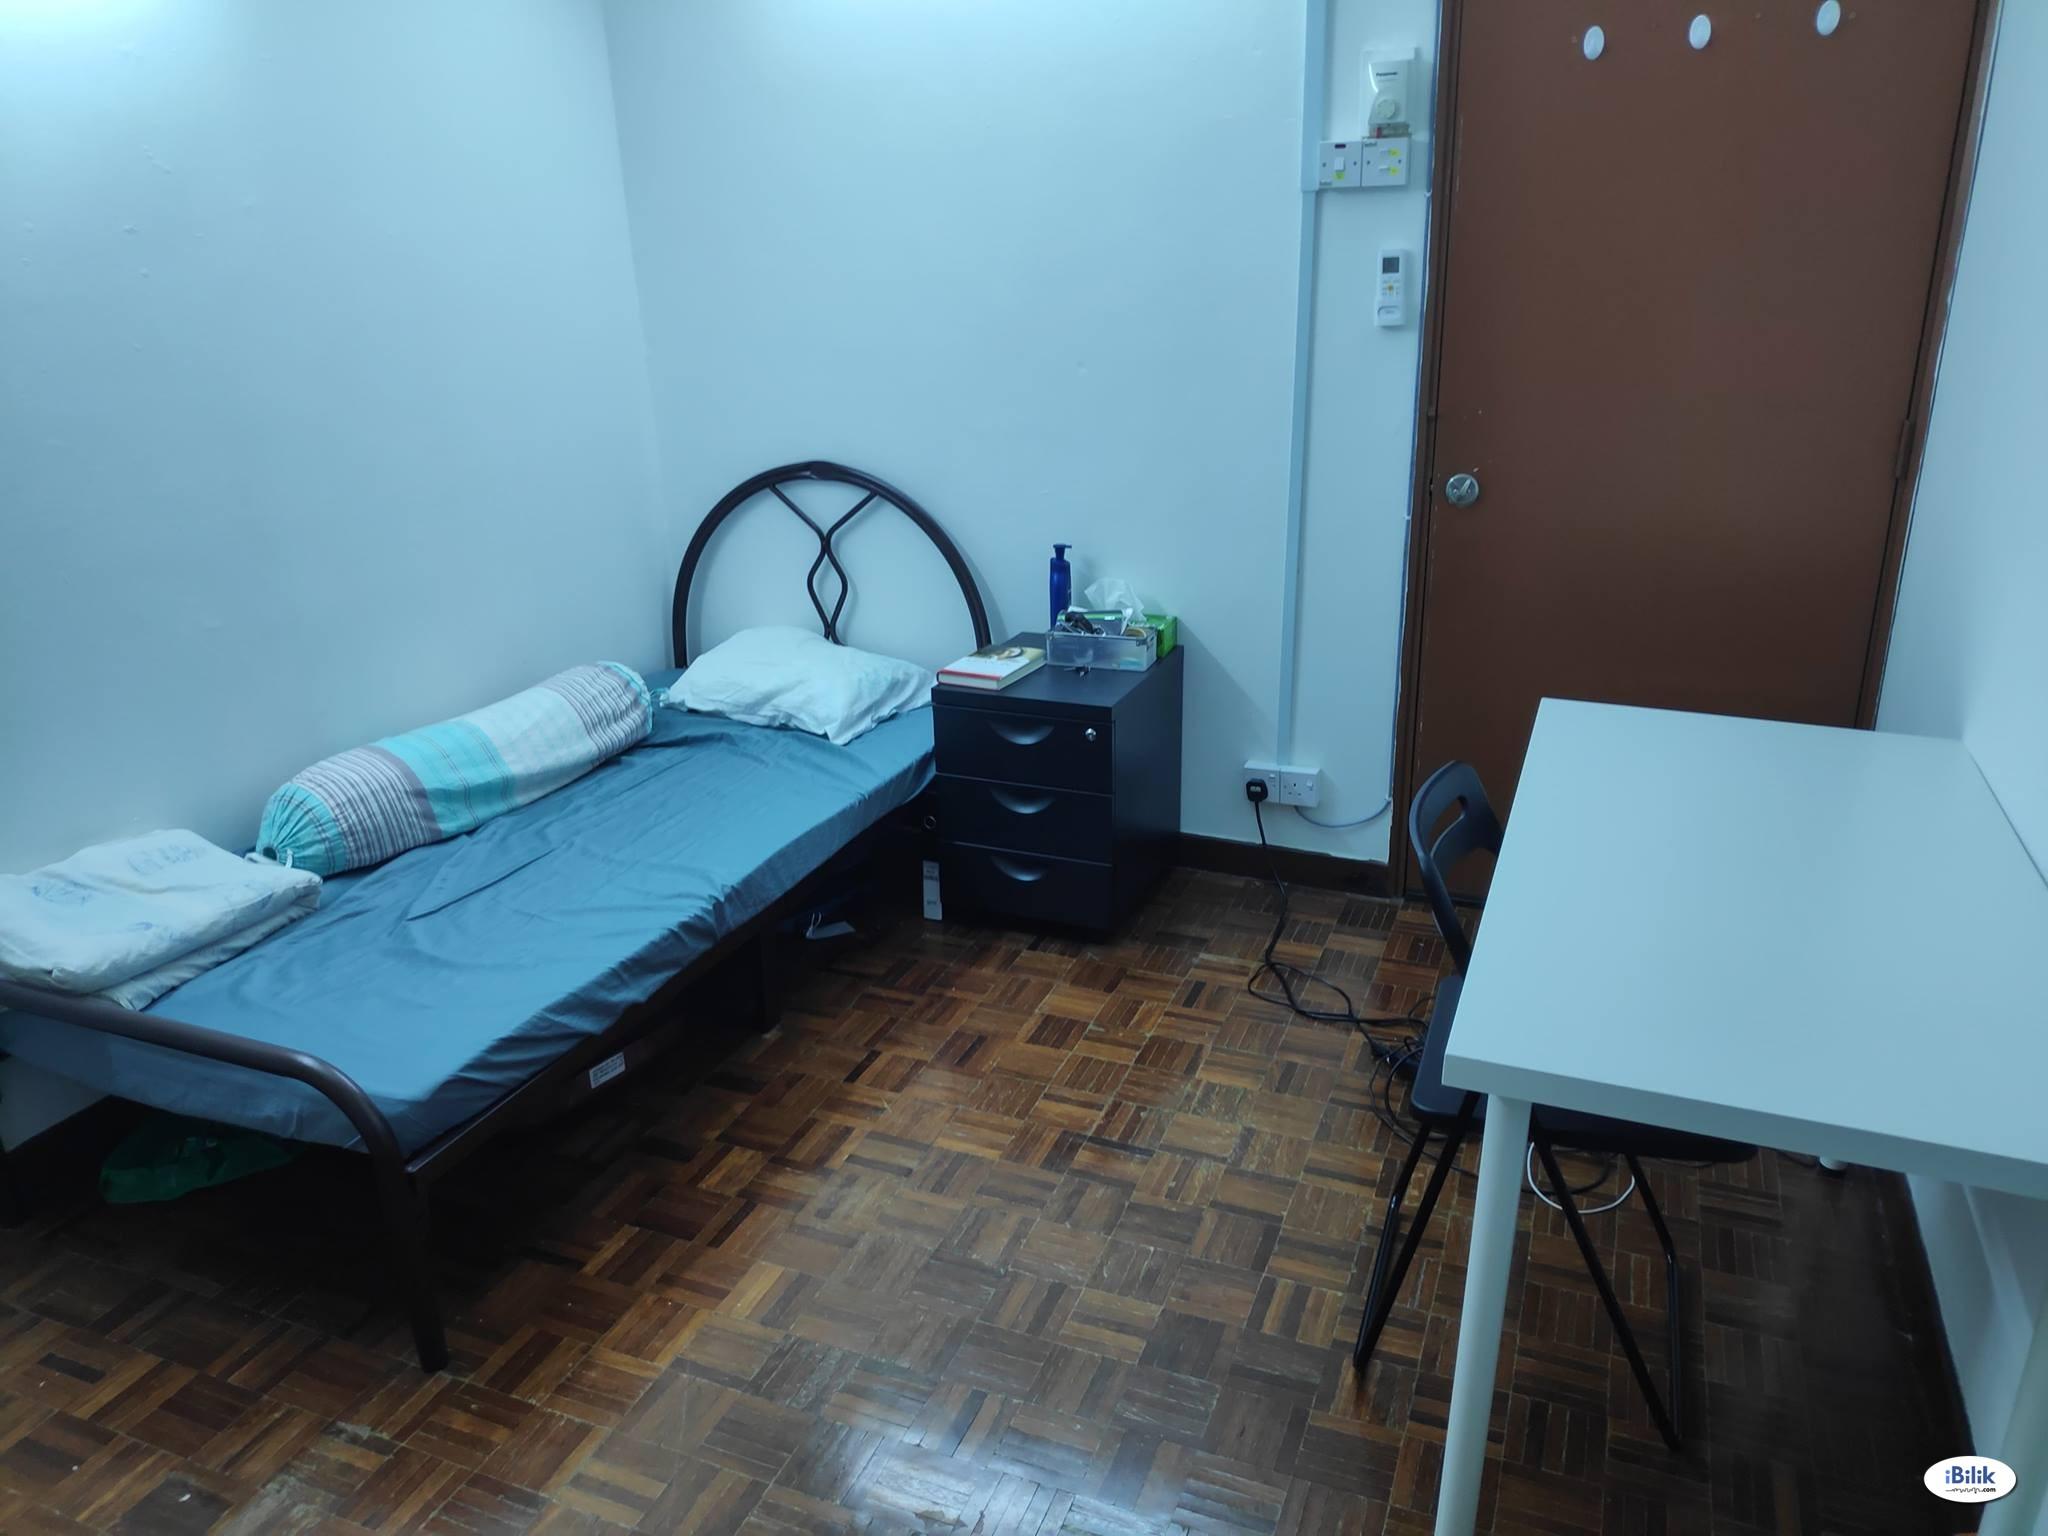 New Renovation Available Master Room Rent at SS14, Subang Jaya NEAR LRT SS18, High Speed WiFi